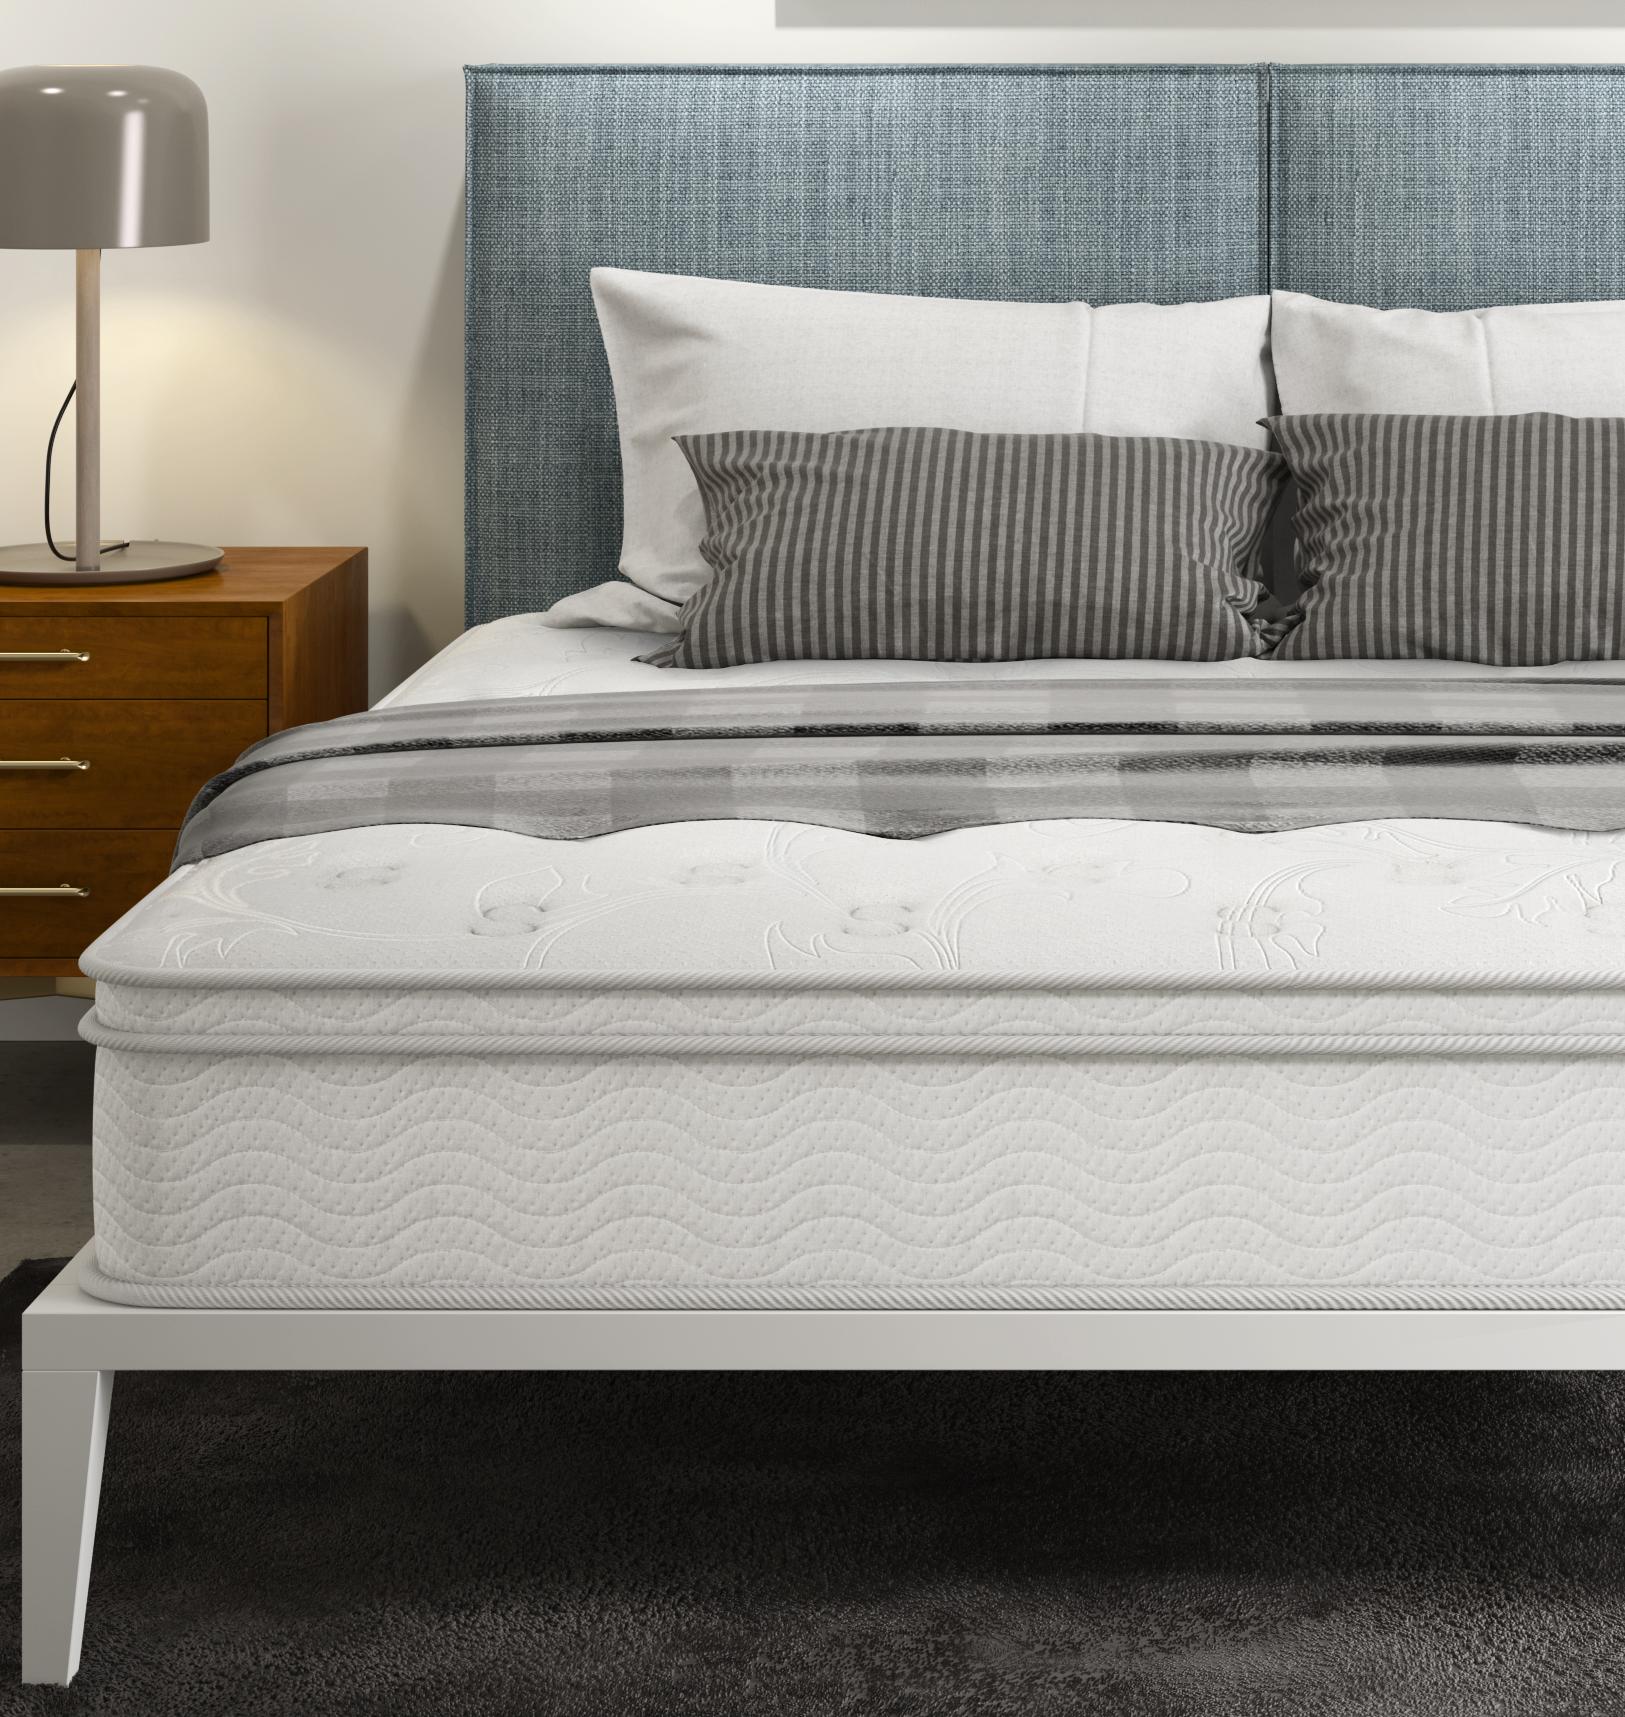 "Signature Sleep 10"" Sunrise 5-Zone Conforma Coil Mattress, Multiple Sizes"